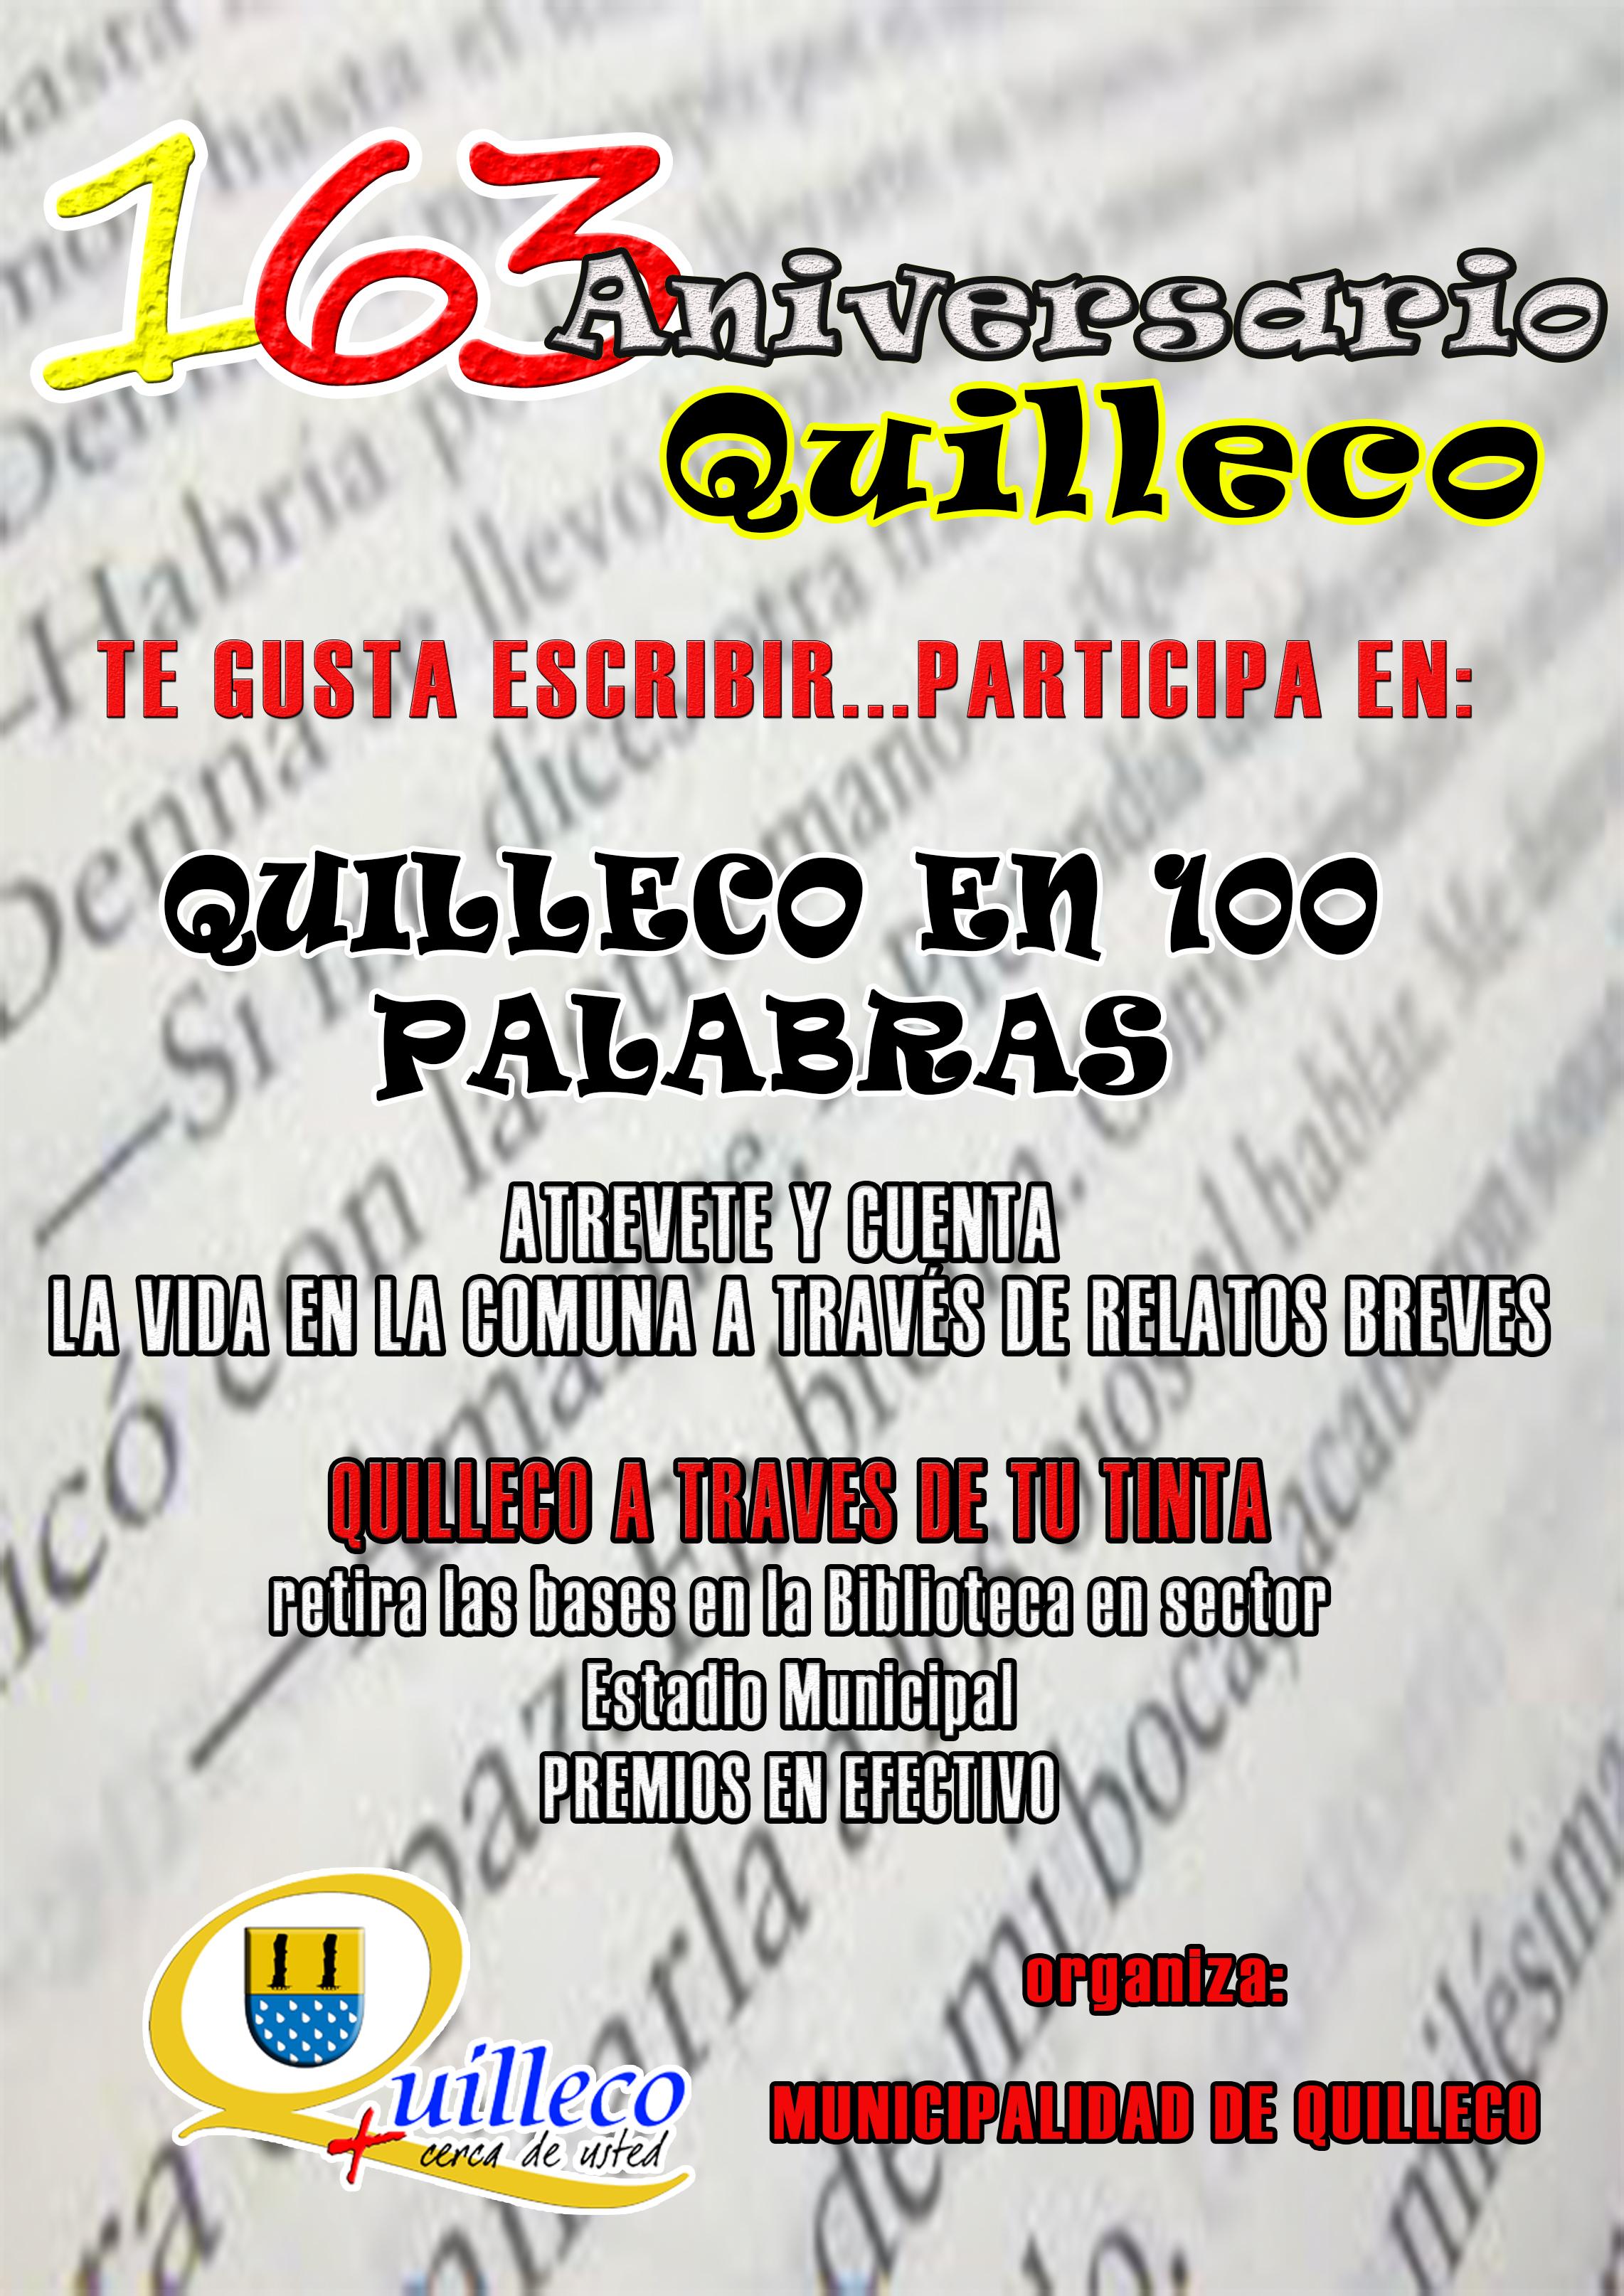 Quilleco en 100 Palabras – CONCURSO ANIVERSARIO 163 QUILLECO